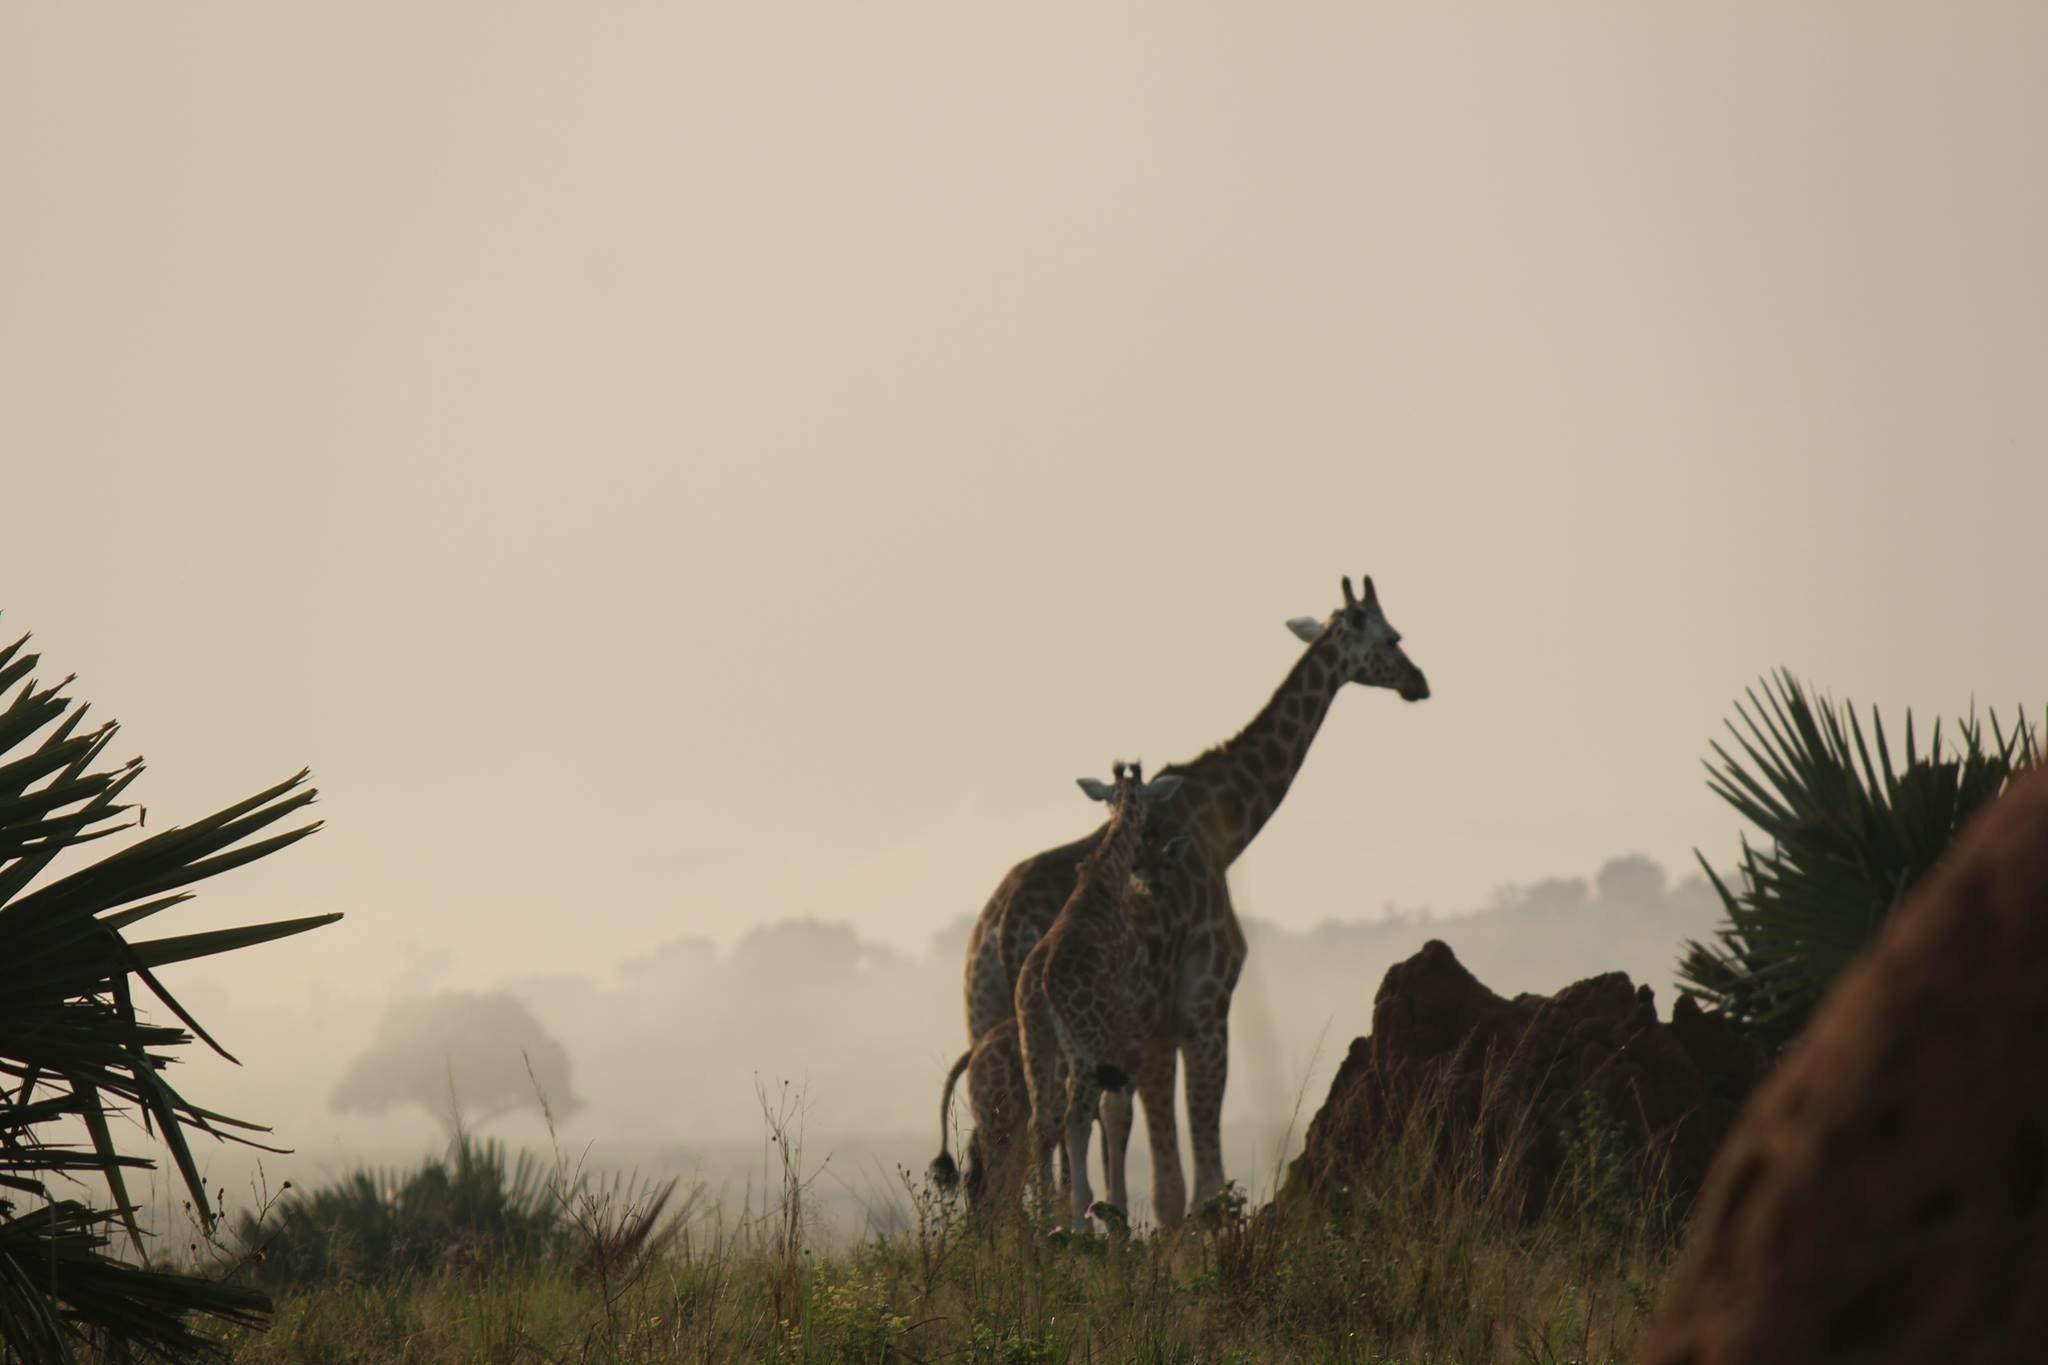 Early mornings by Rowan Stroop